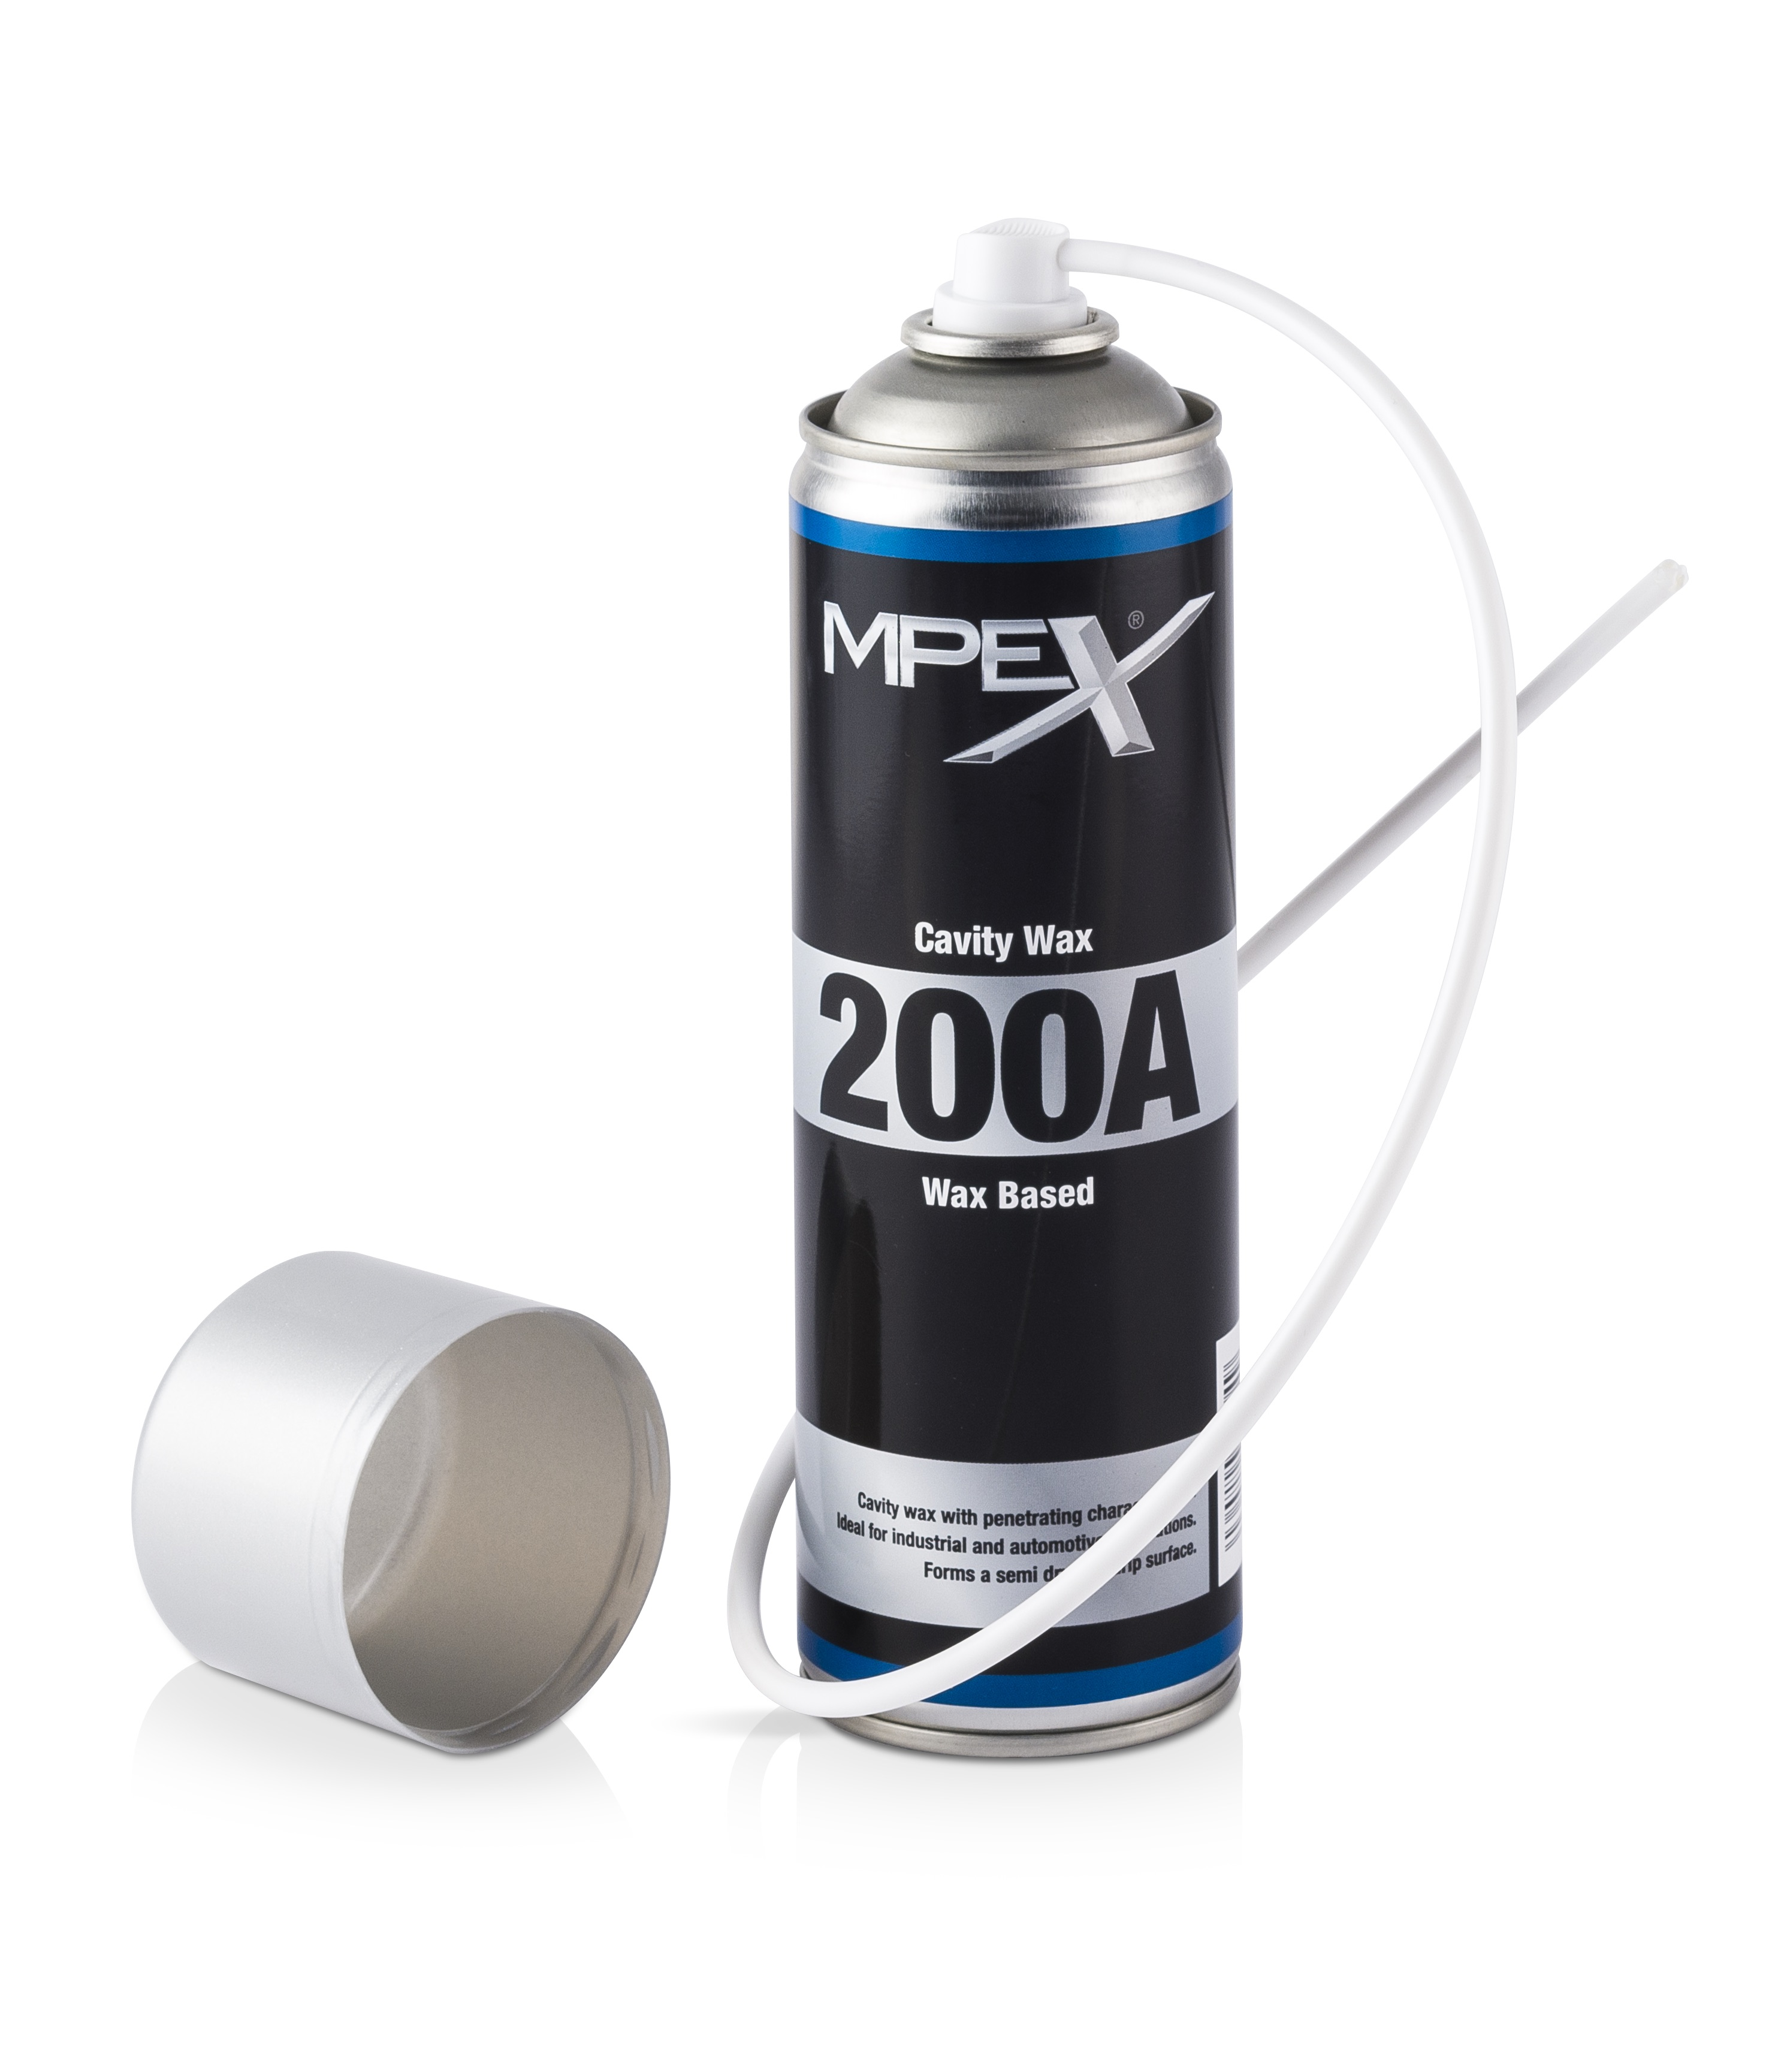 MPEX MPEX200A/S Automotive Car Van 200A Cavity Wax 500ml Aerosol Single